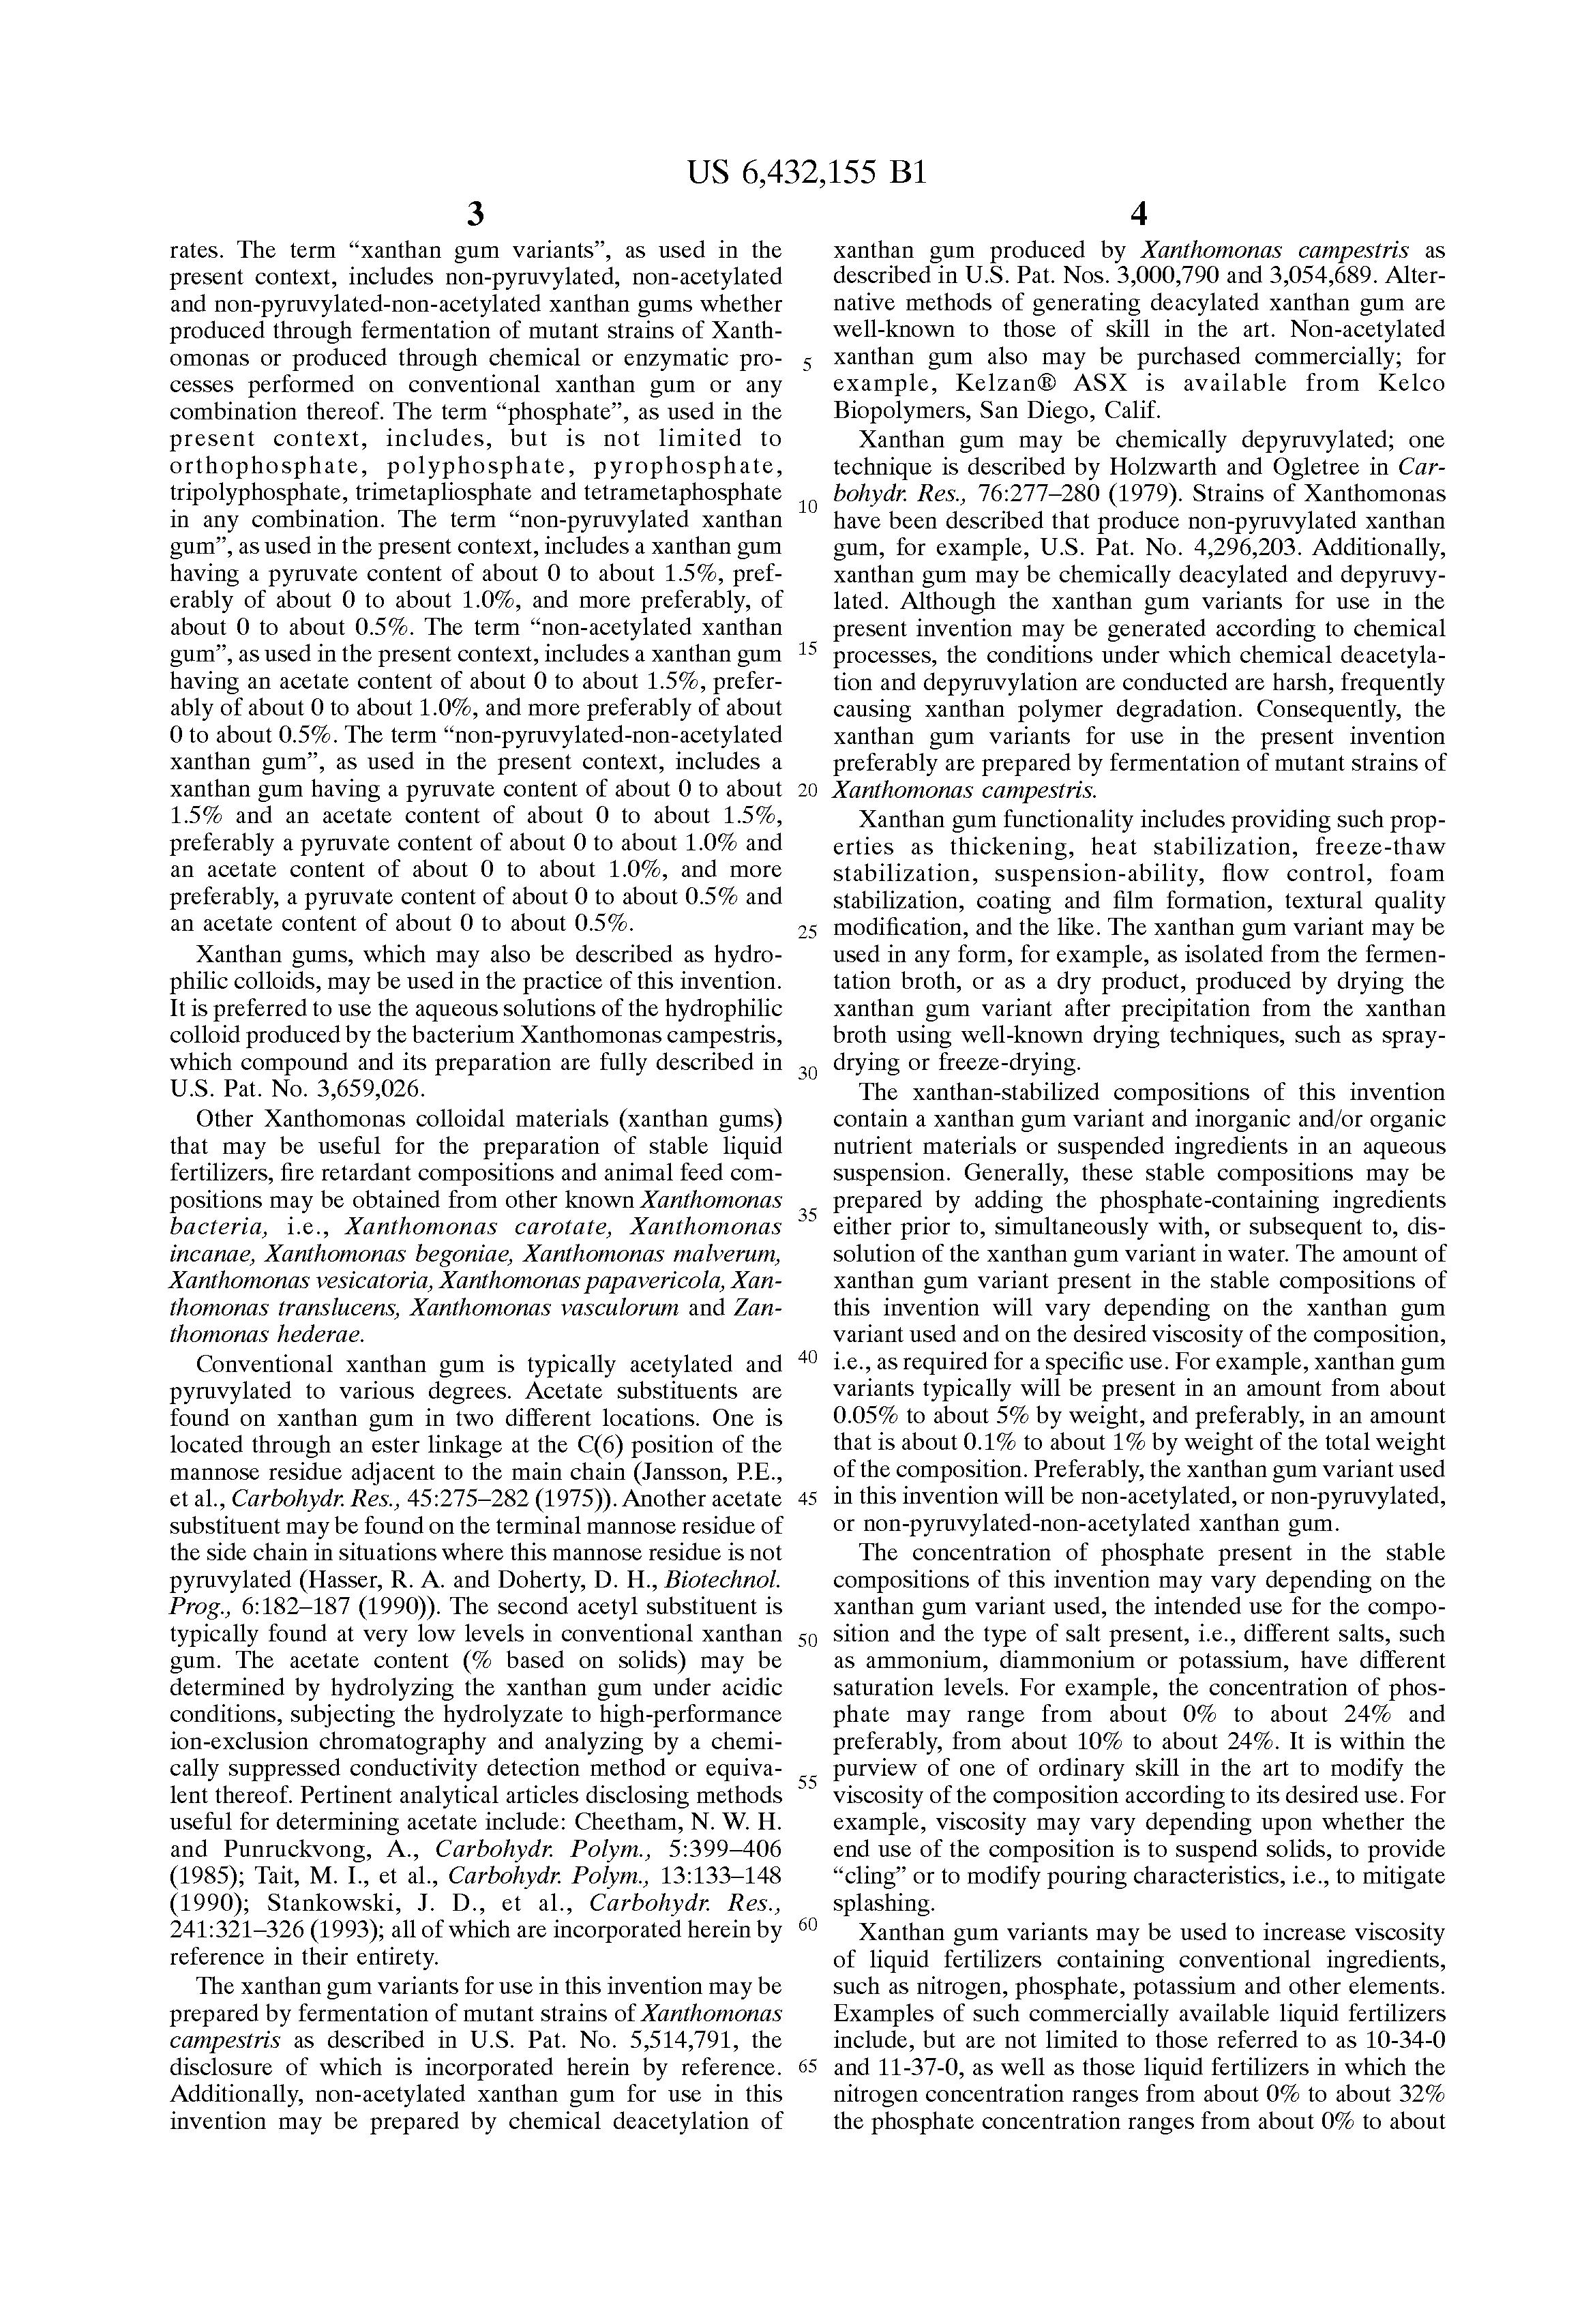 cp kelco xanthan gum pdf